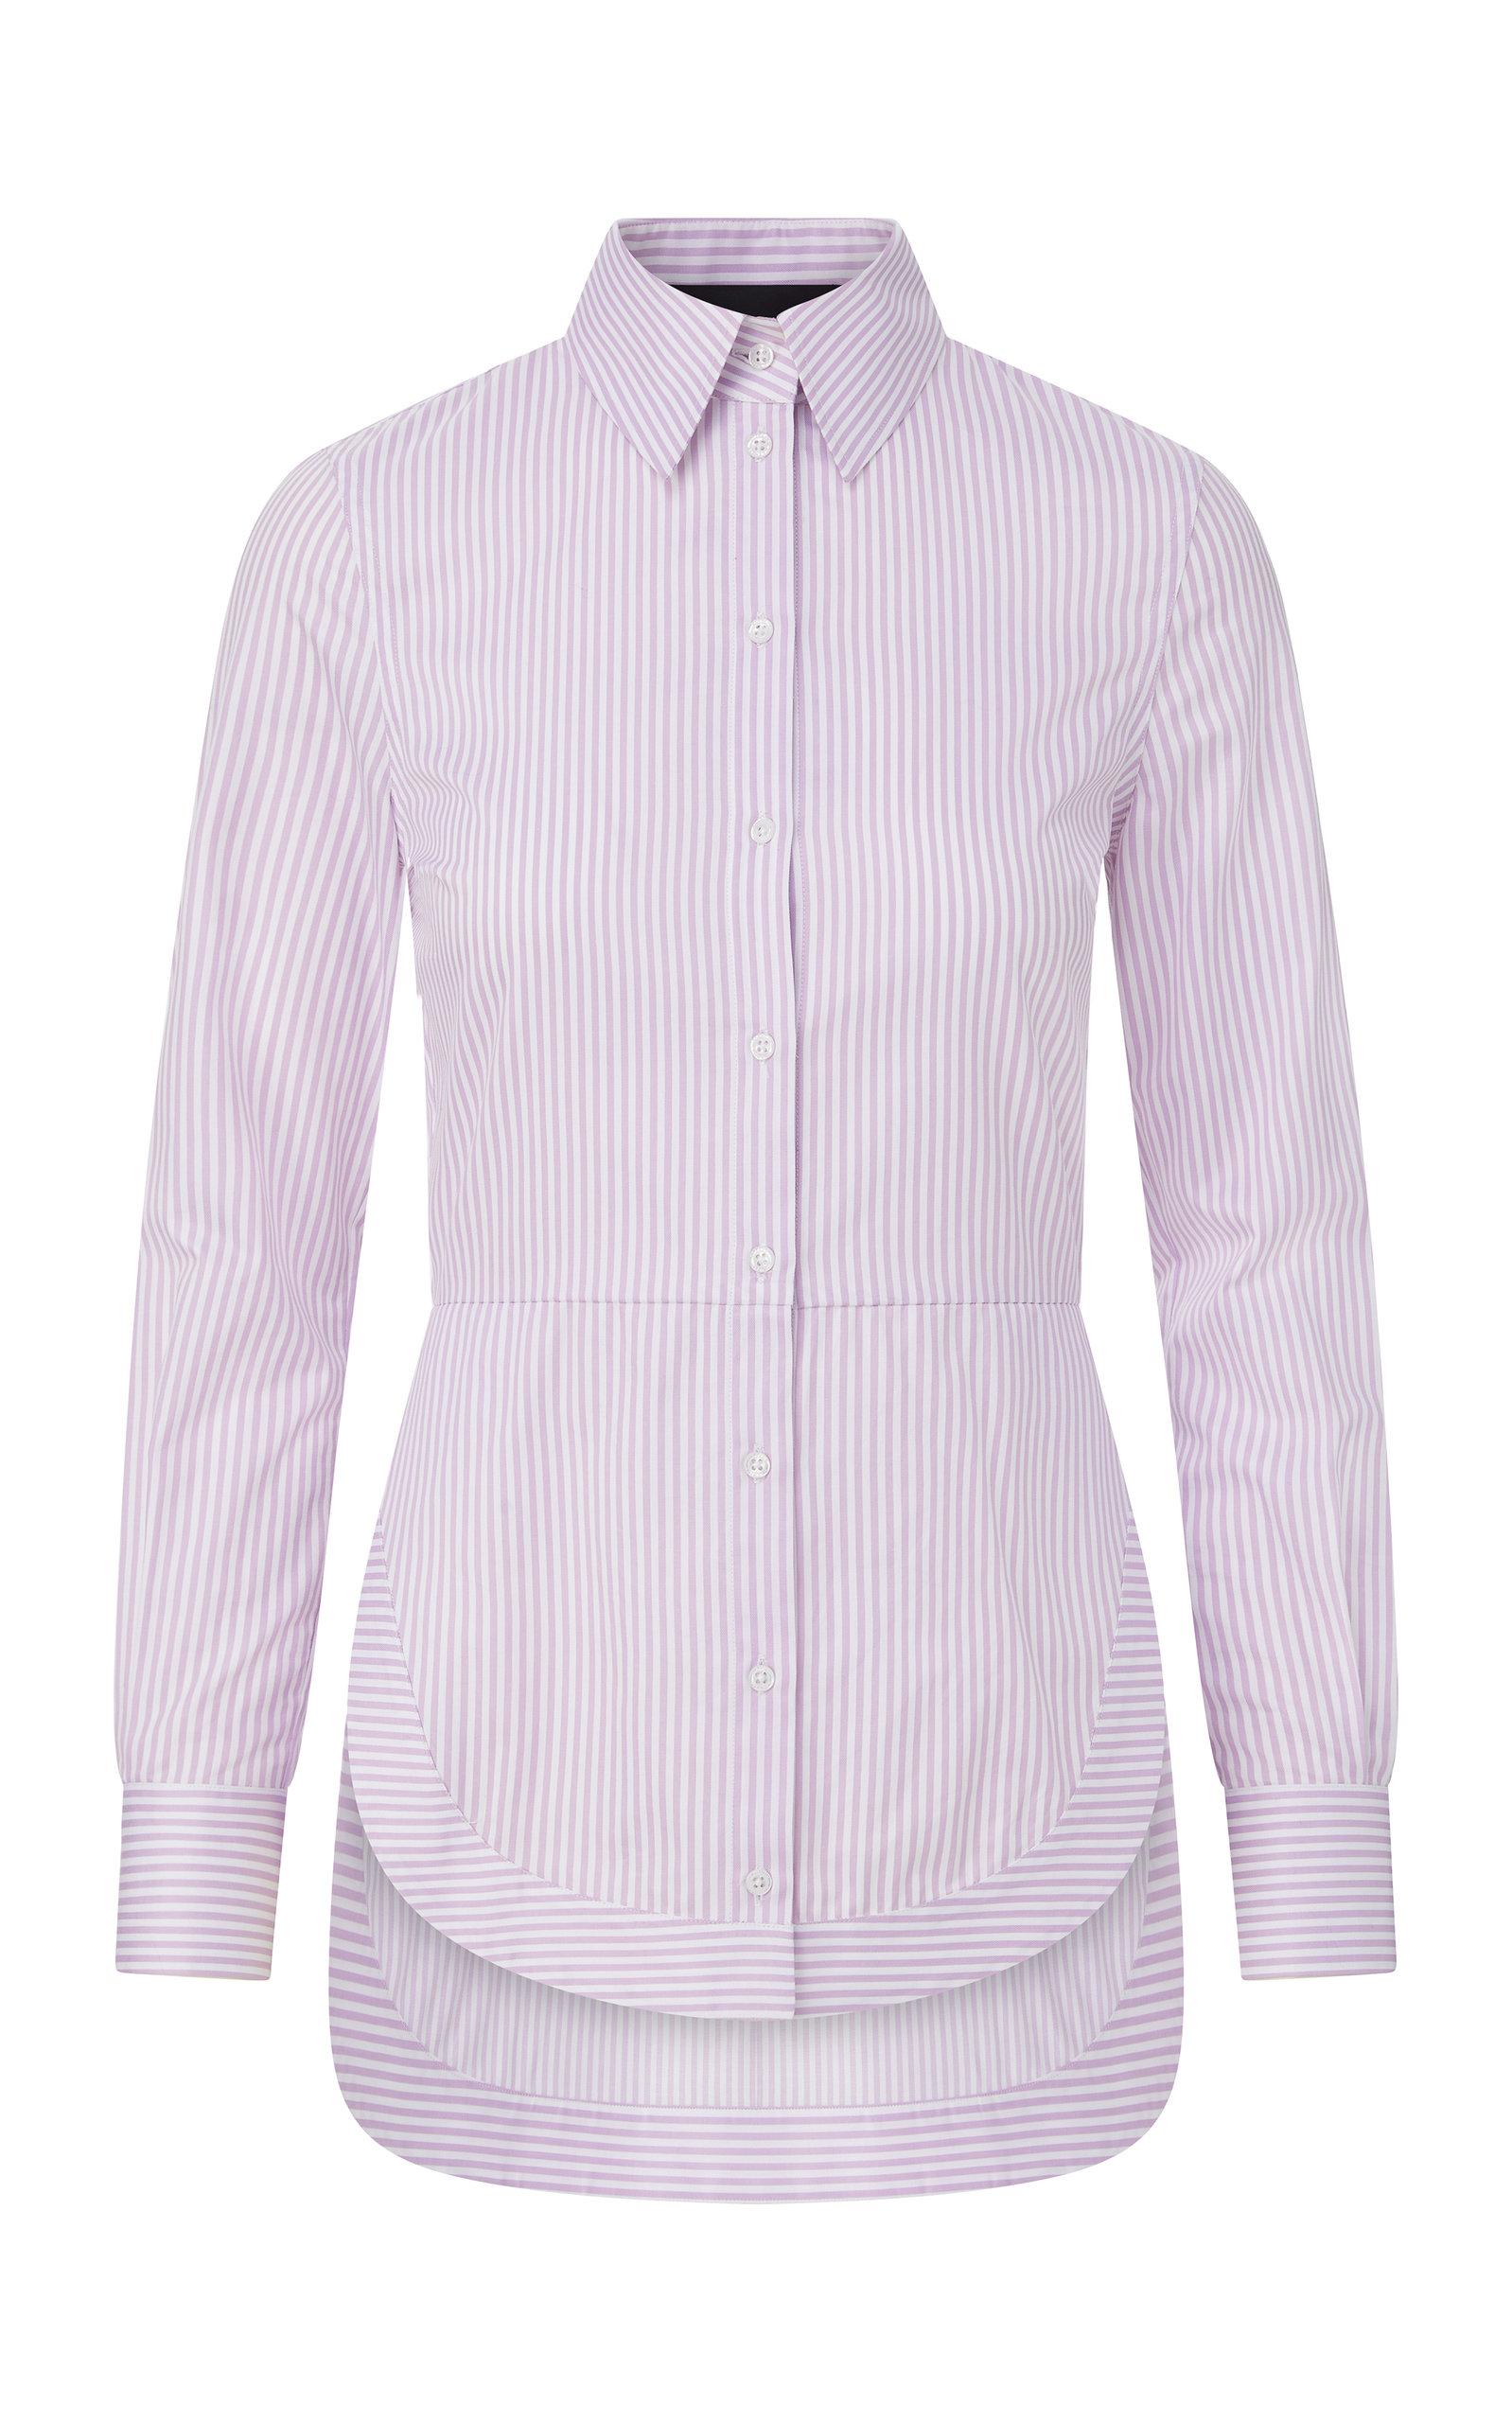 Women's Striped Cotton Poplin Shirt